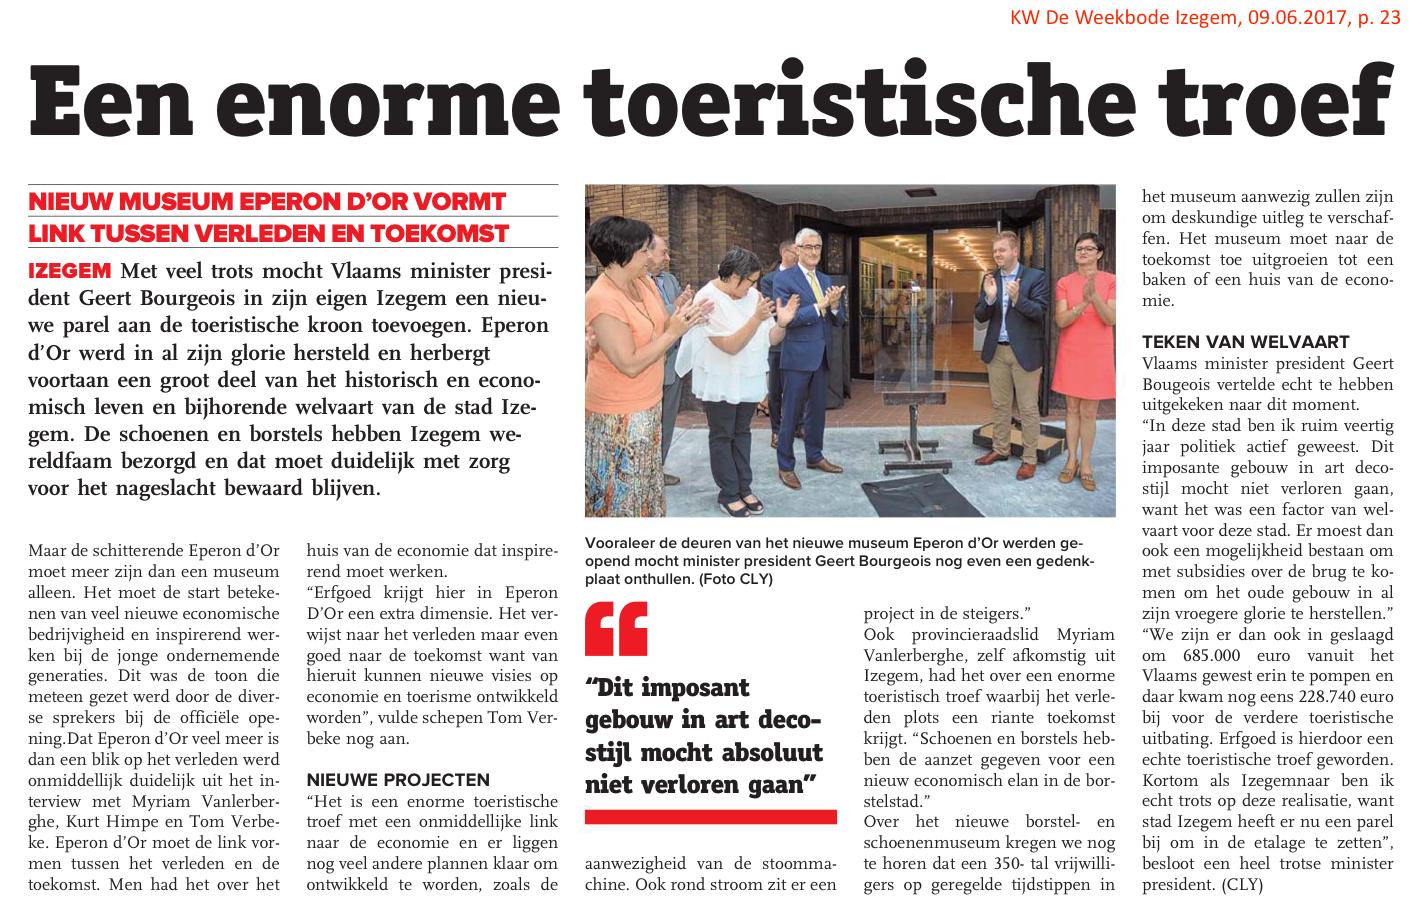 KW De Weekbode Izegem, 09.06.2017, p. 23